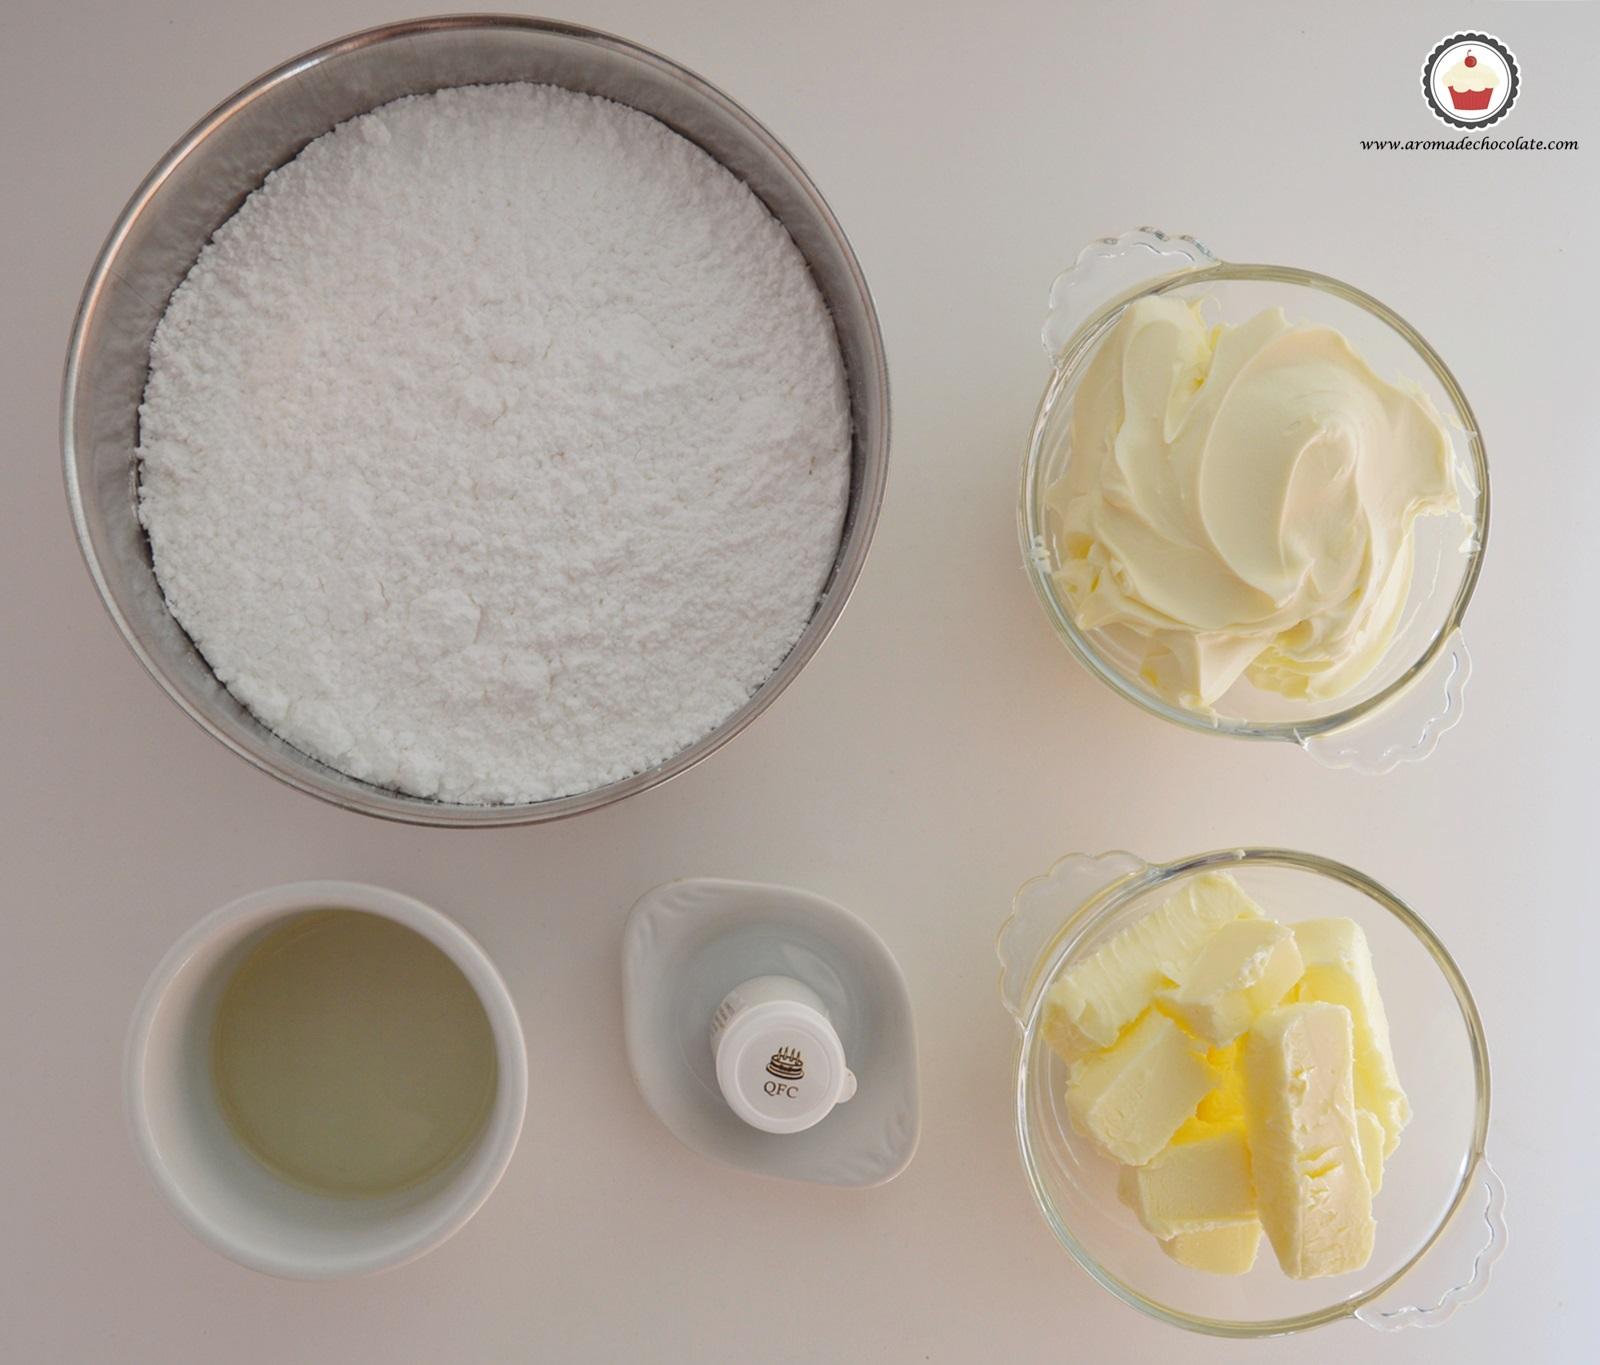 Ingredientes buttercream de queso al cava. Aroma de chocolate